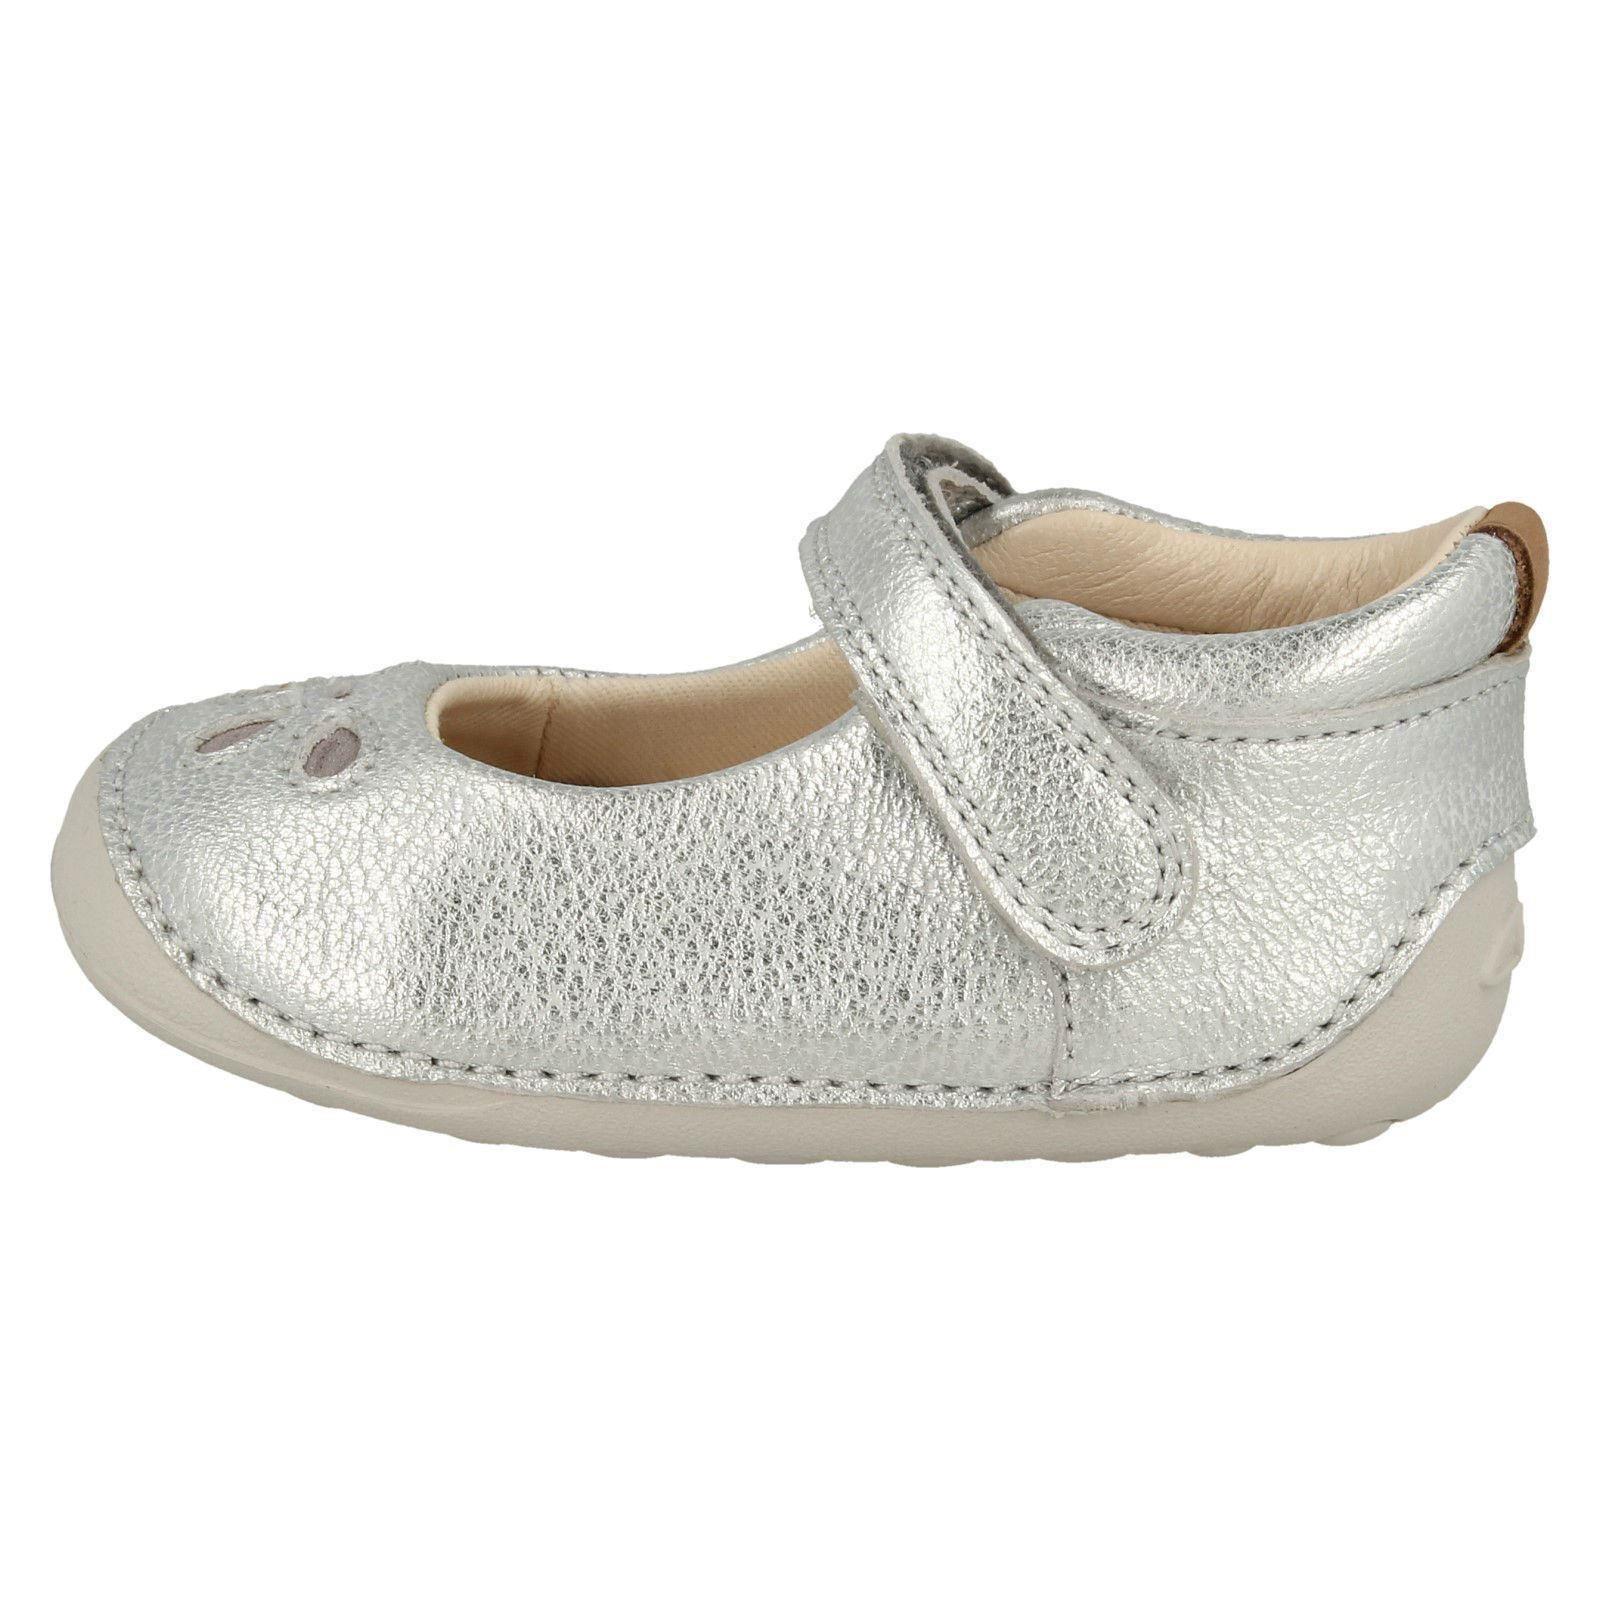 Clarks Pre Walker Shoes for sale online